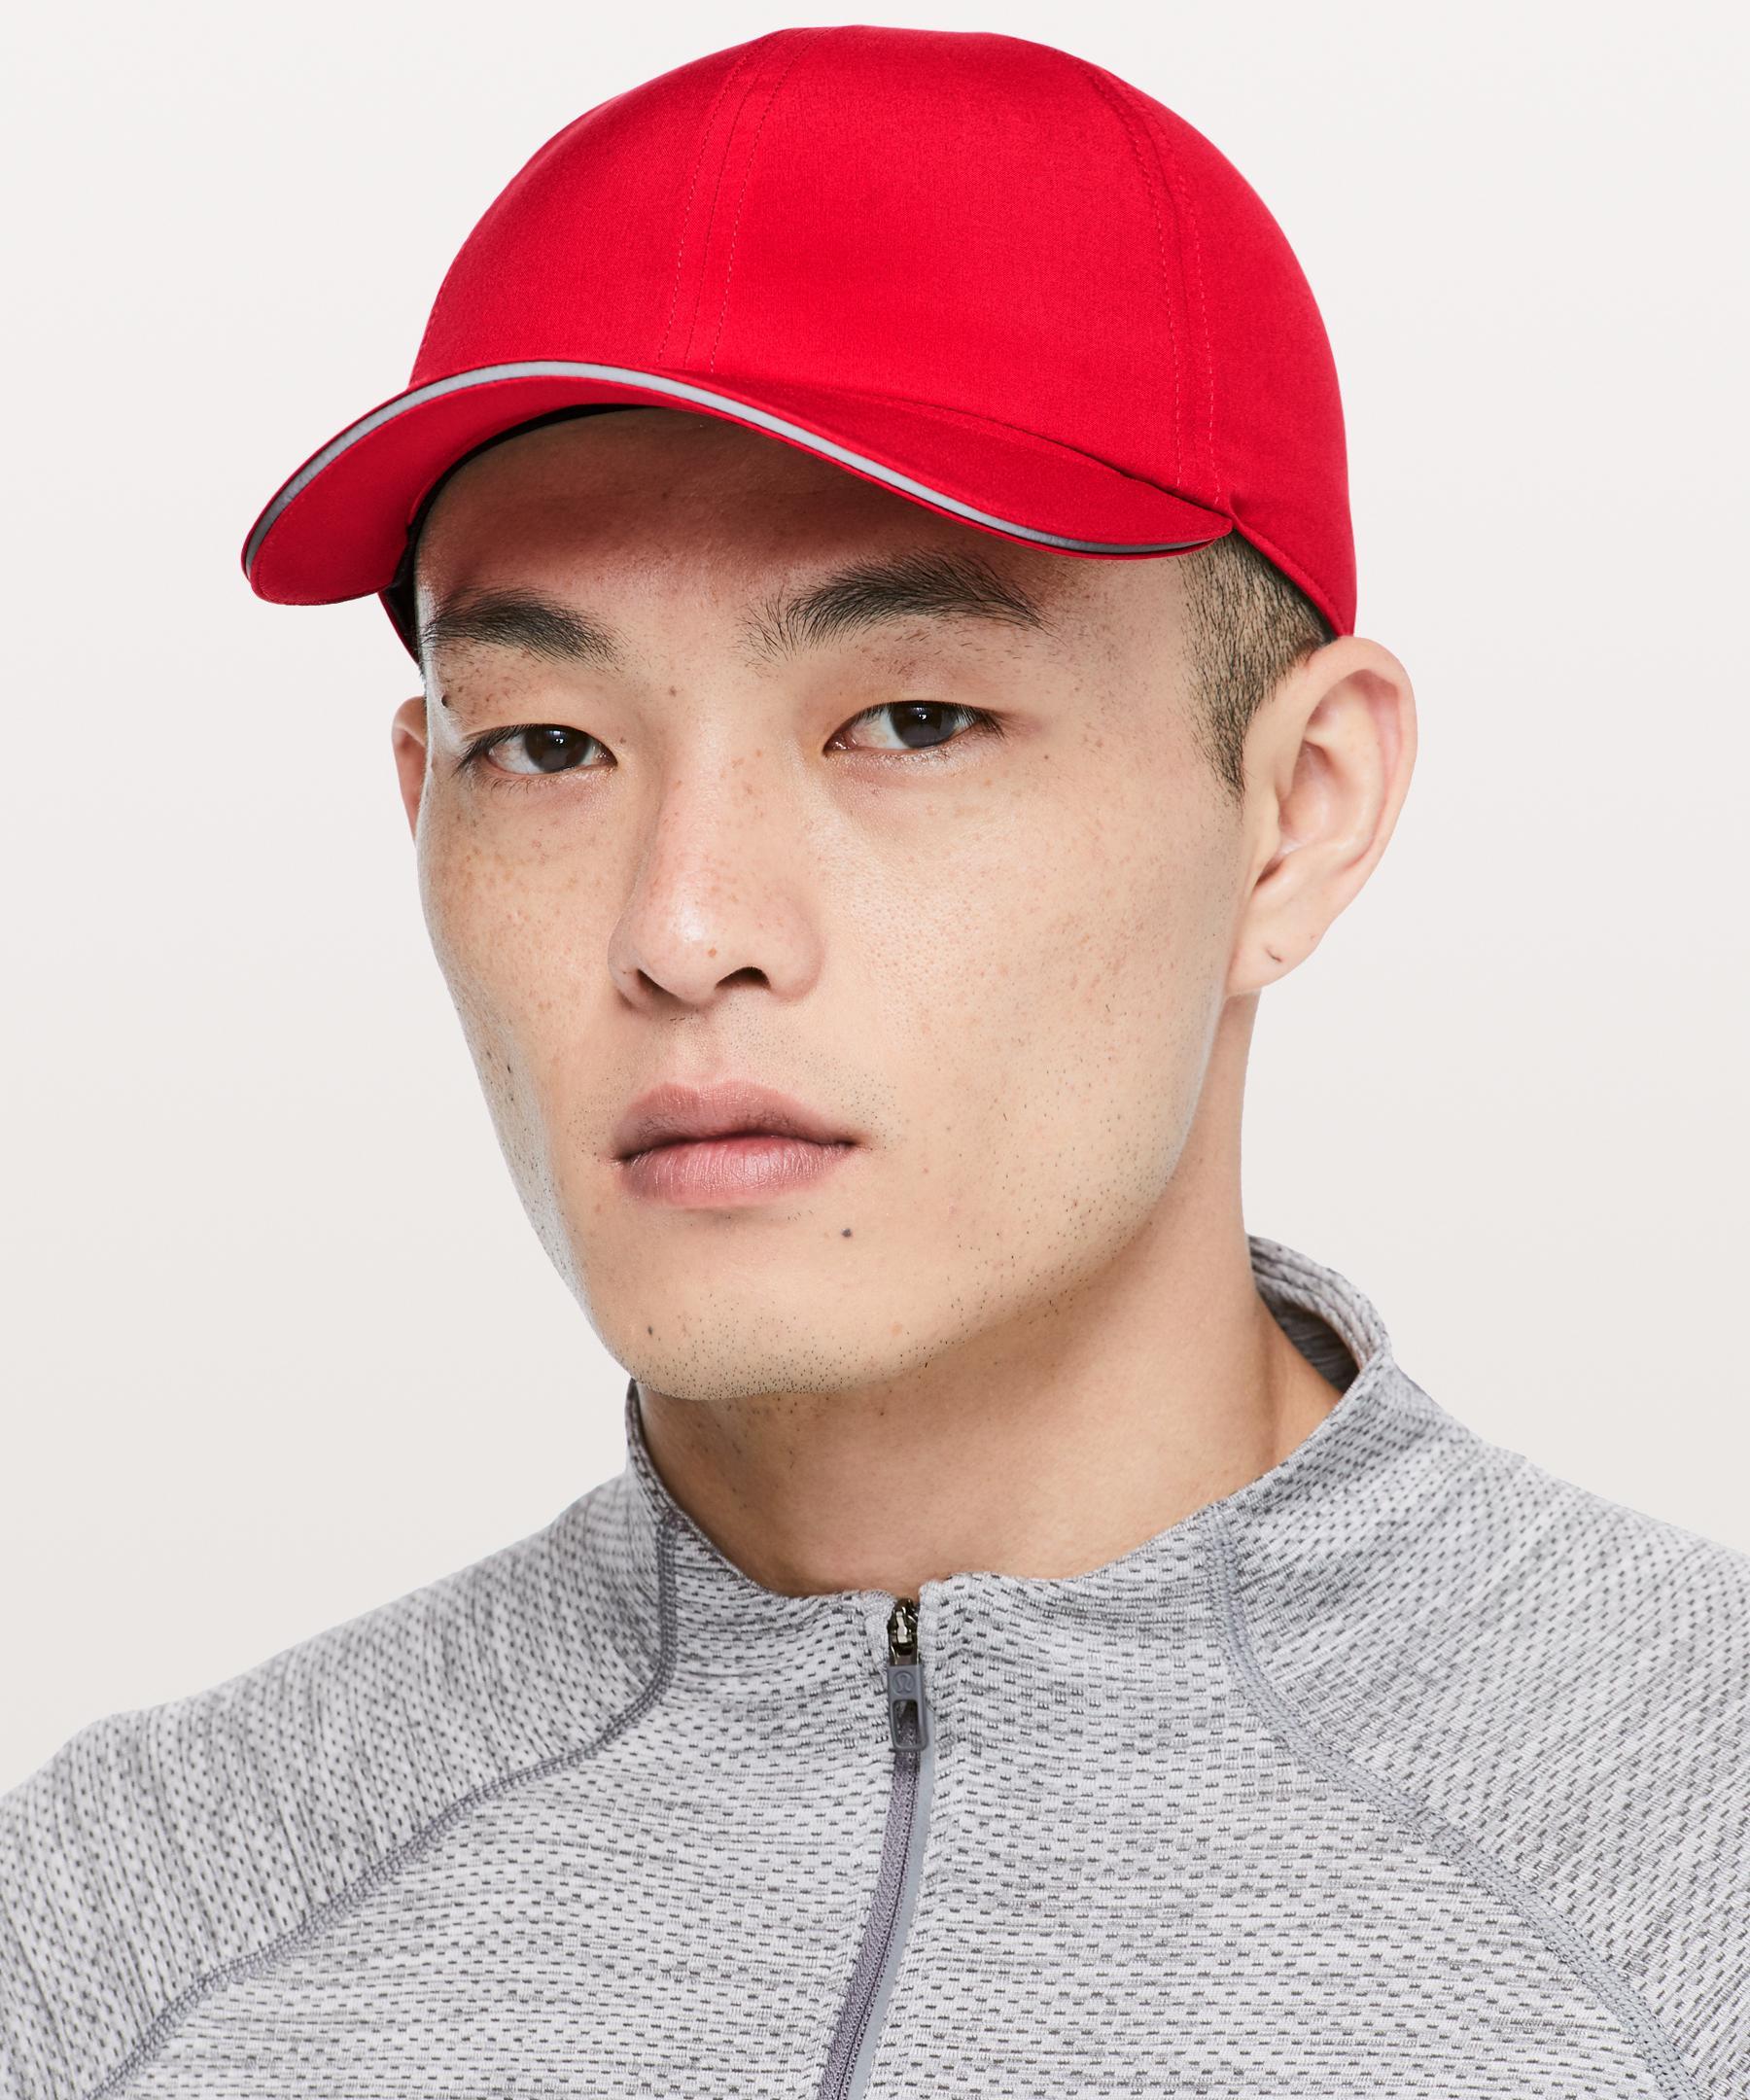 c4a9f3fd1413b lululemon athletica Lightspeed Run Hat in Red for Men - Lyst